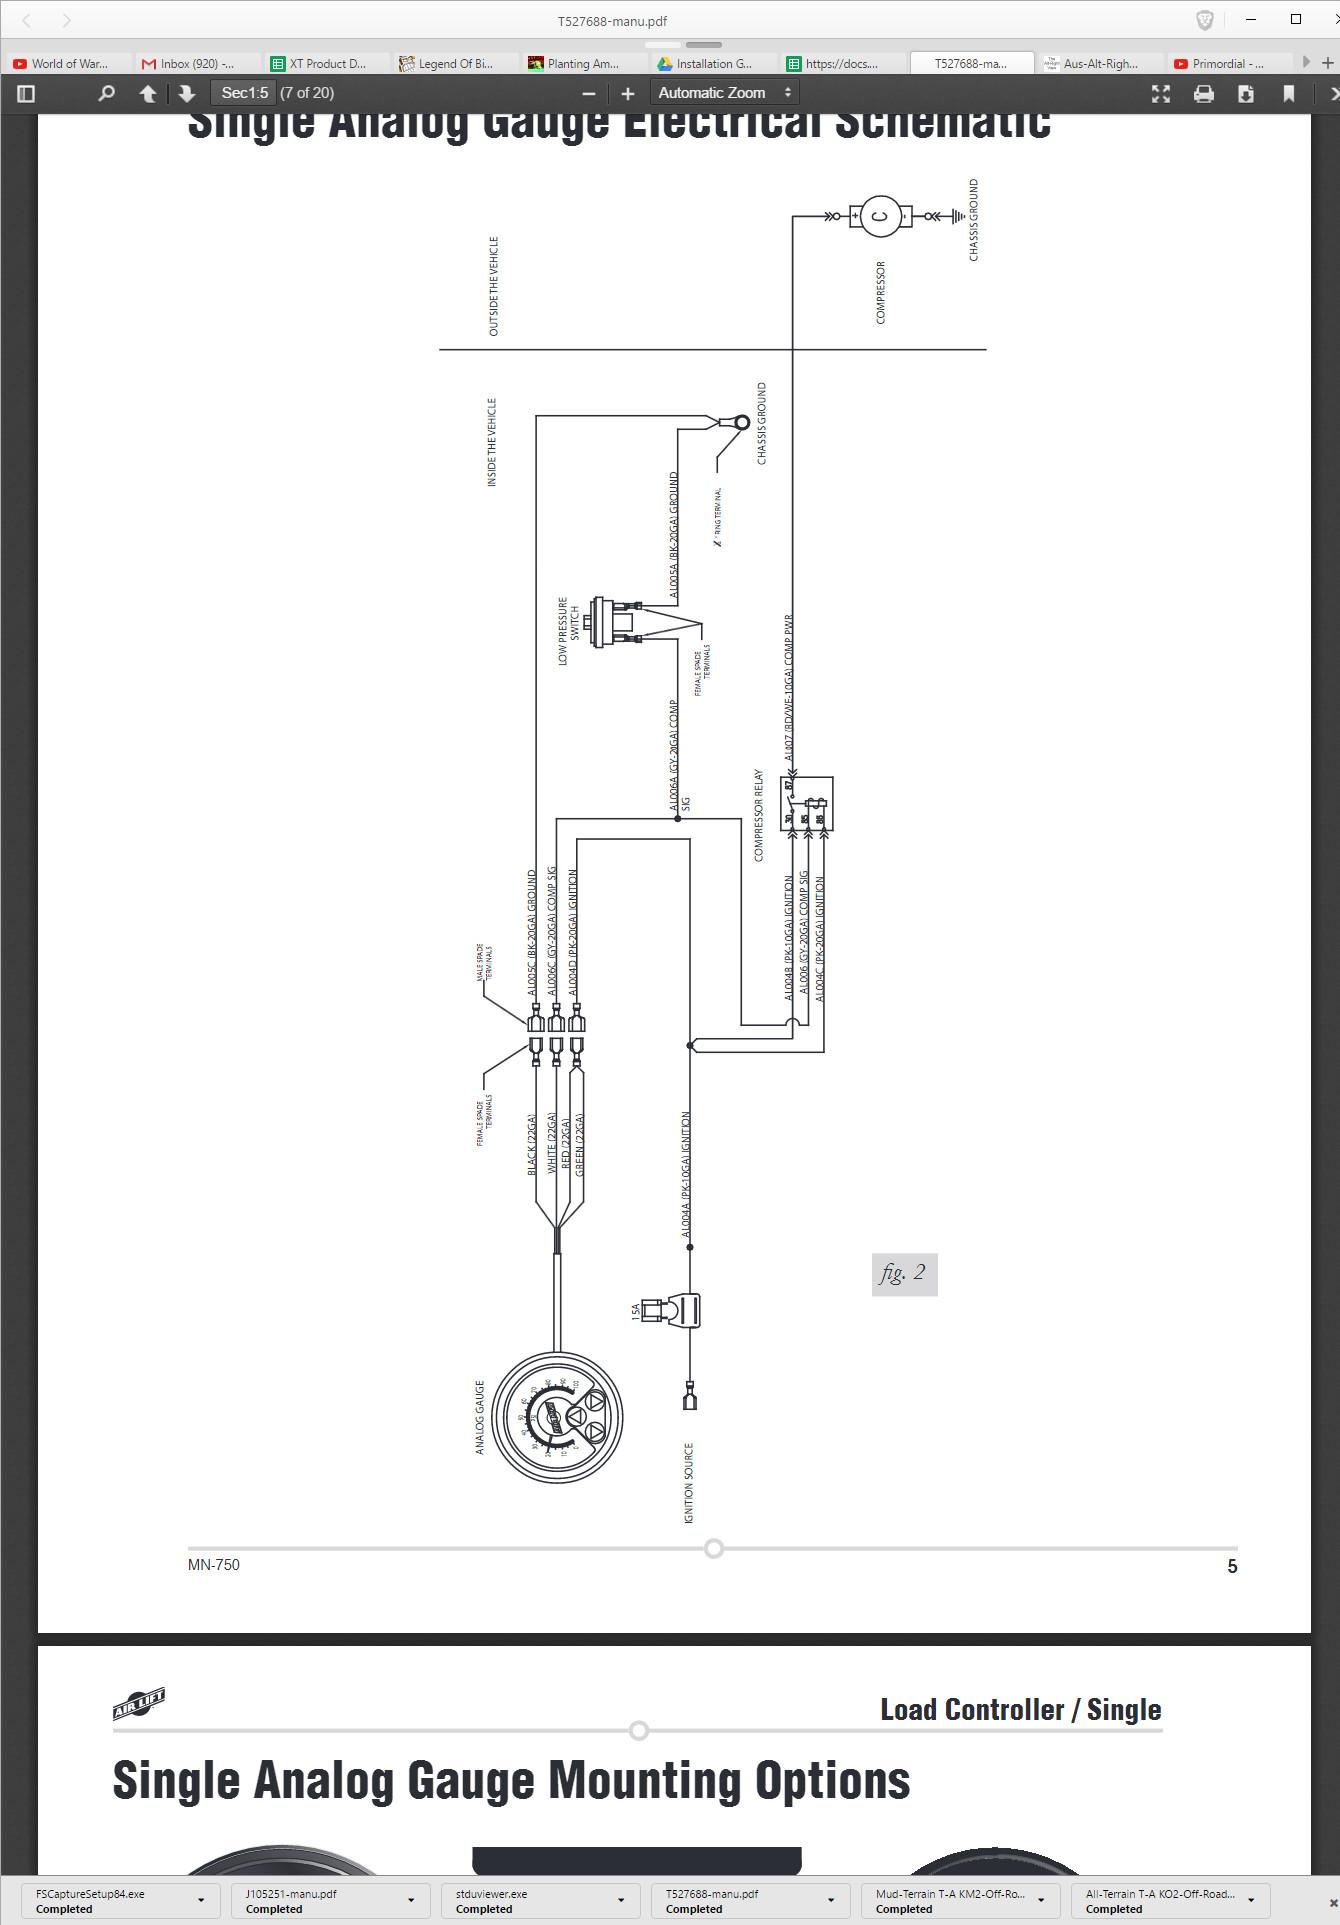 hight resolution of single analog gauge mounting hardware on bottom of gauge